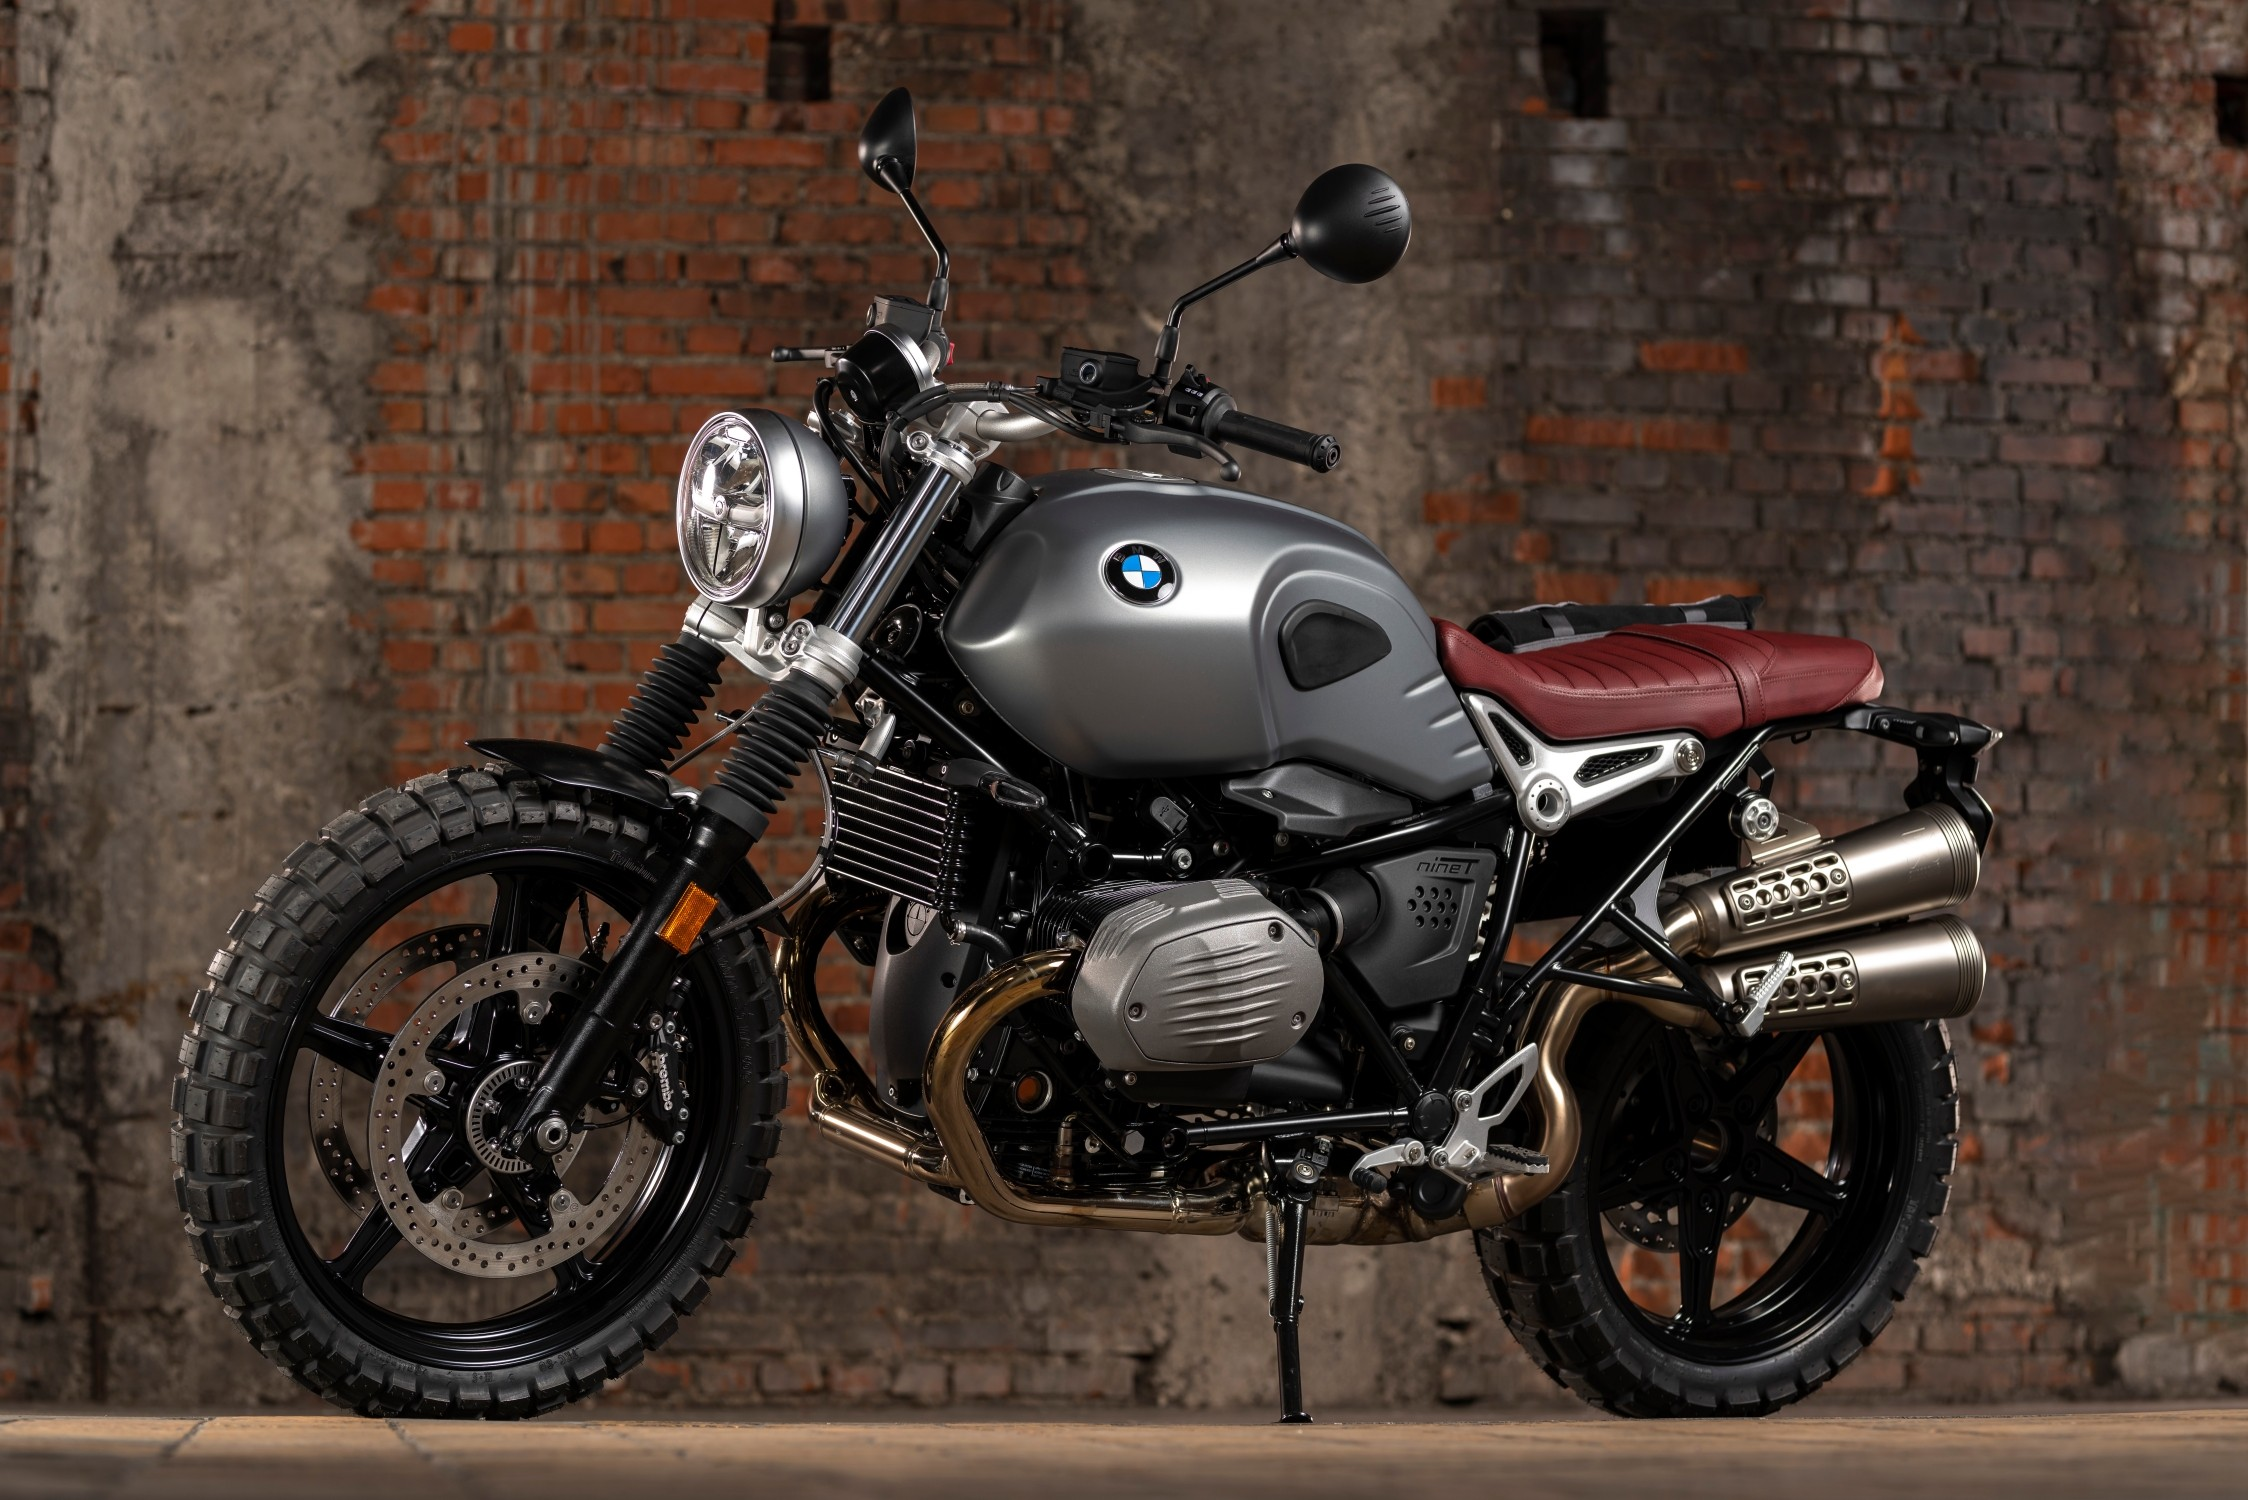 The BMW R nineT Scrambler